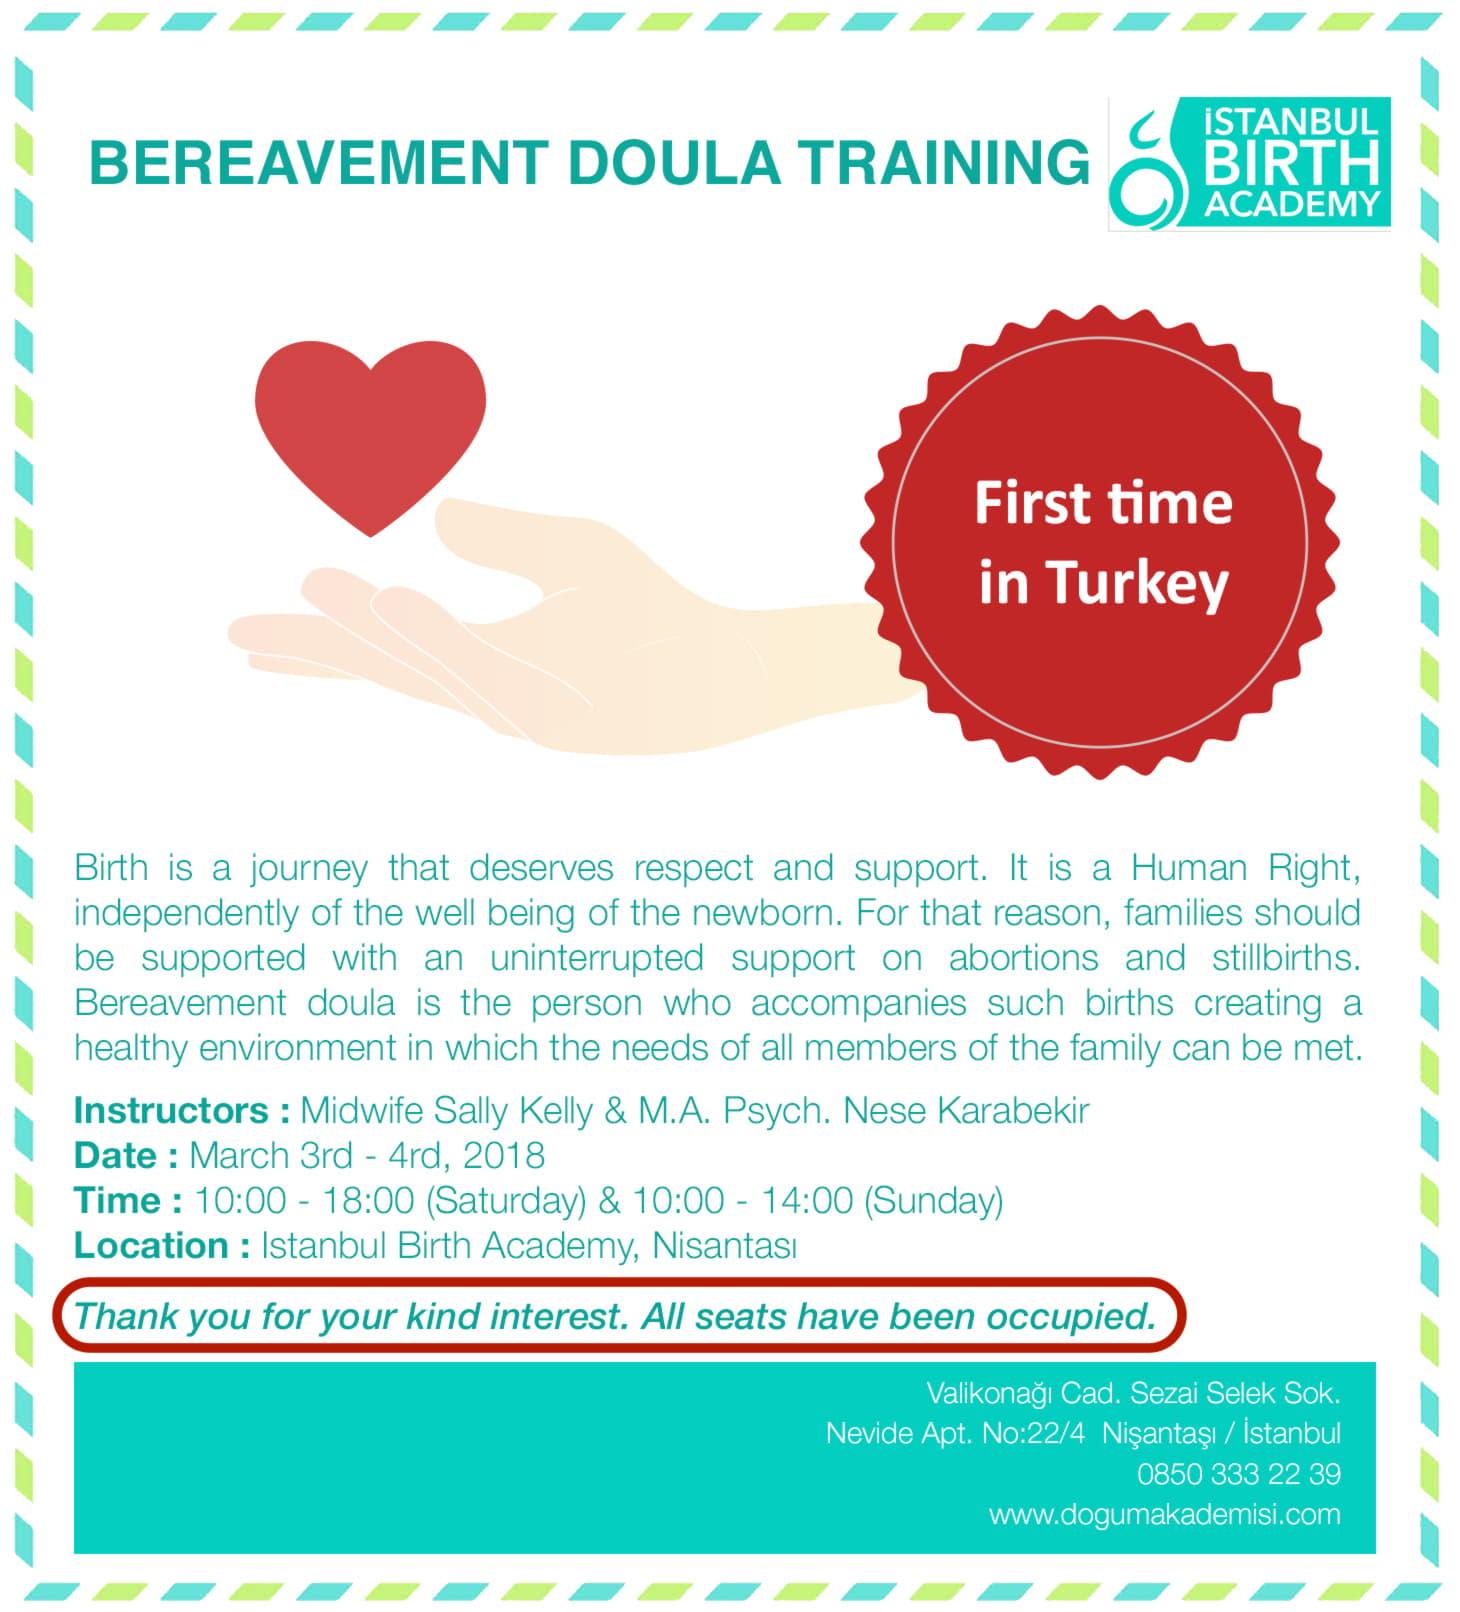 Bereavement Doula Training